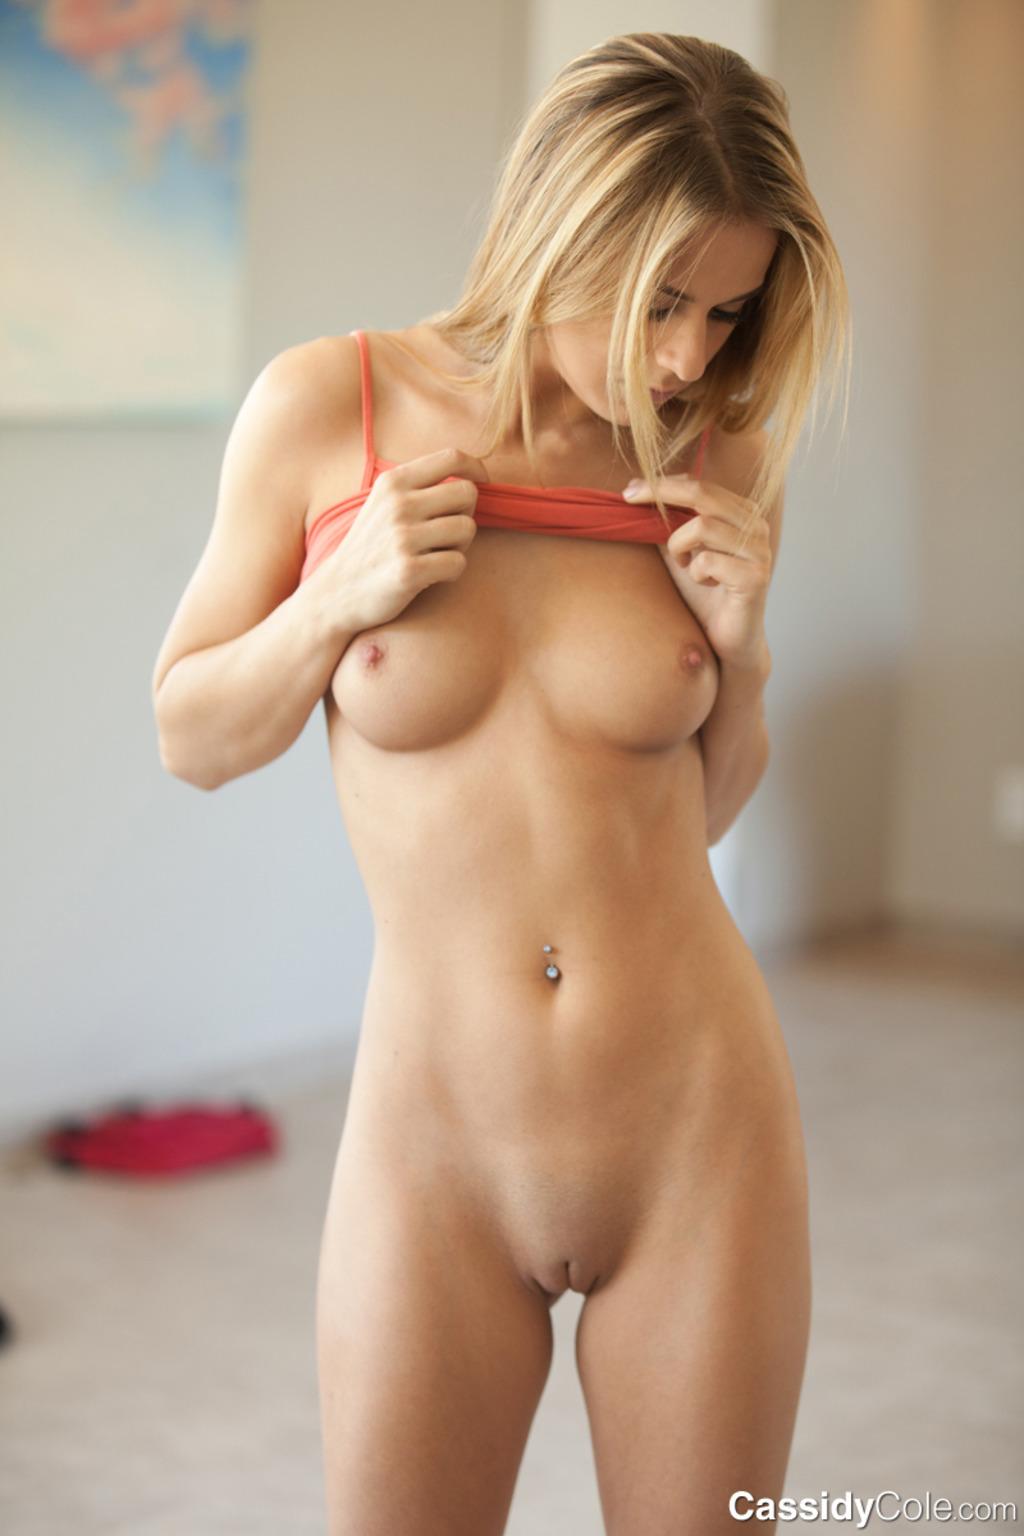 Cassidy cole porn